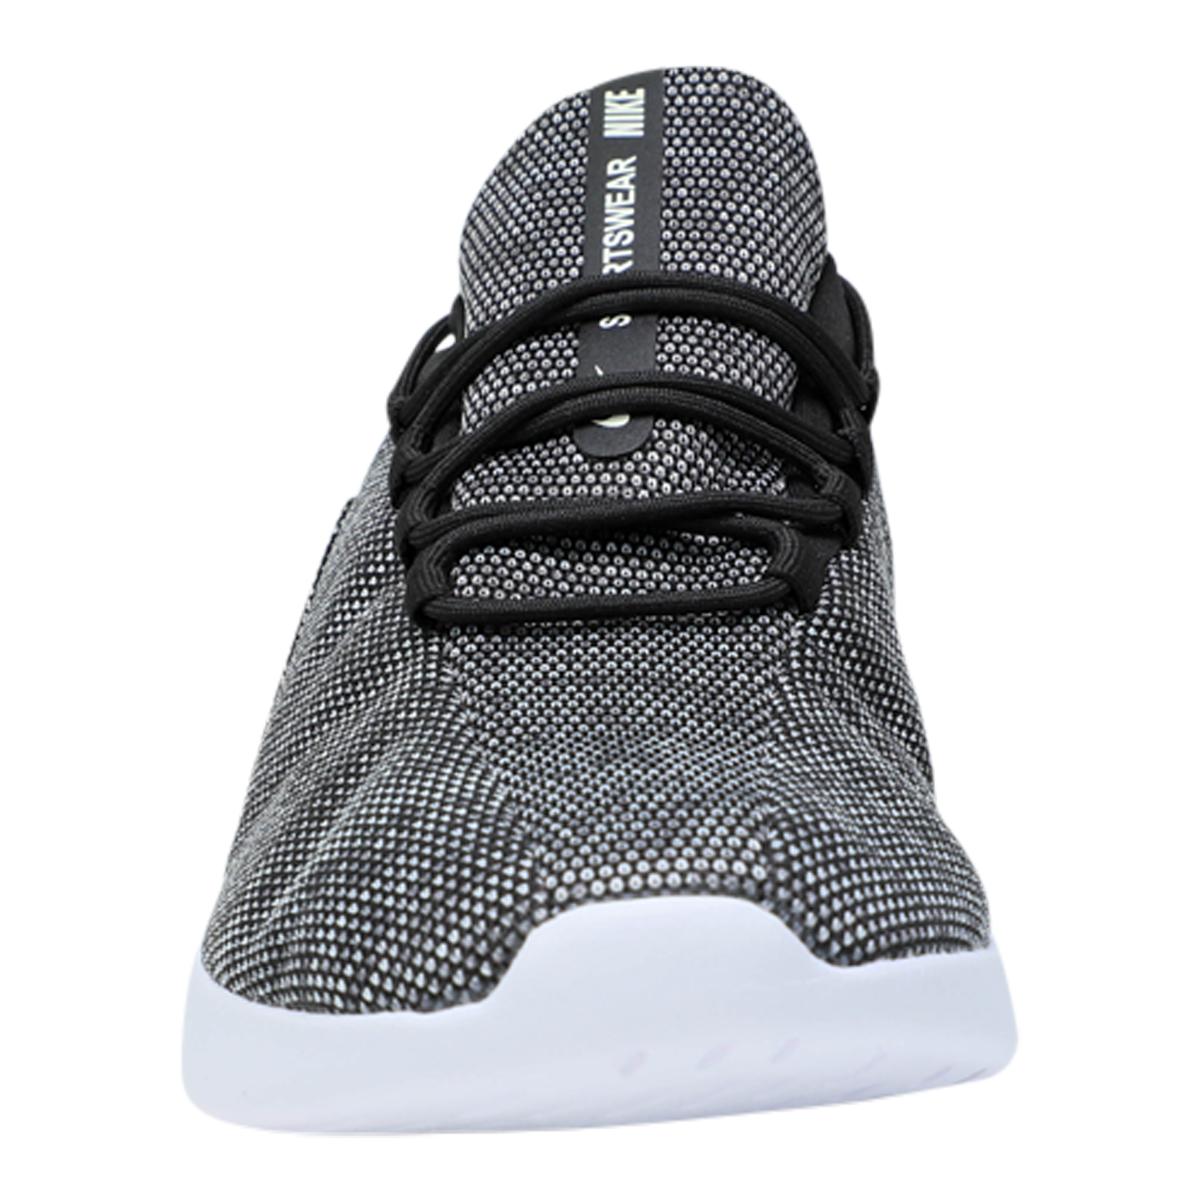 Nike-Men-039-s-Viale-Premium-Running-Shoes thumbnail 9